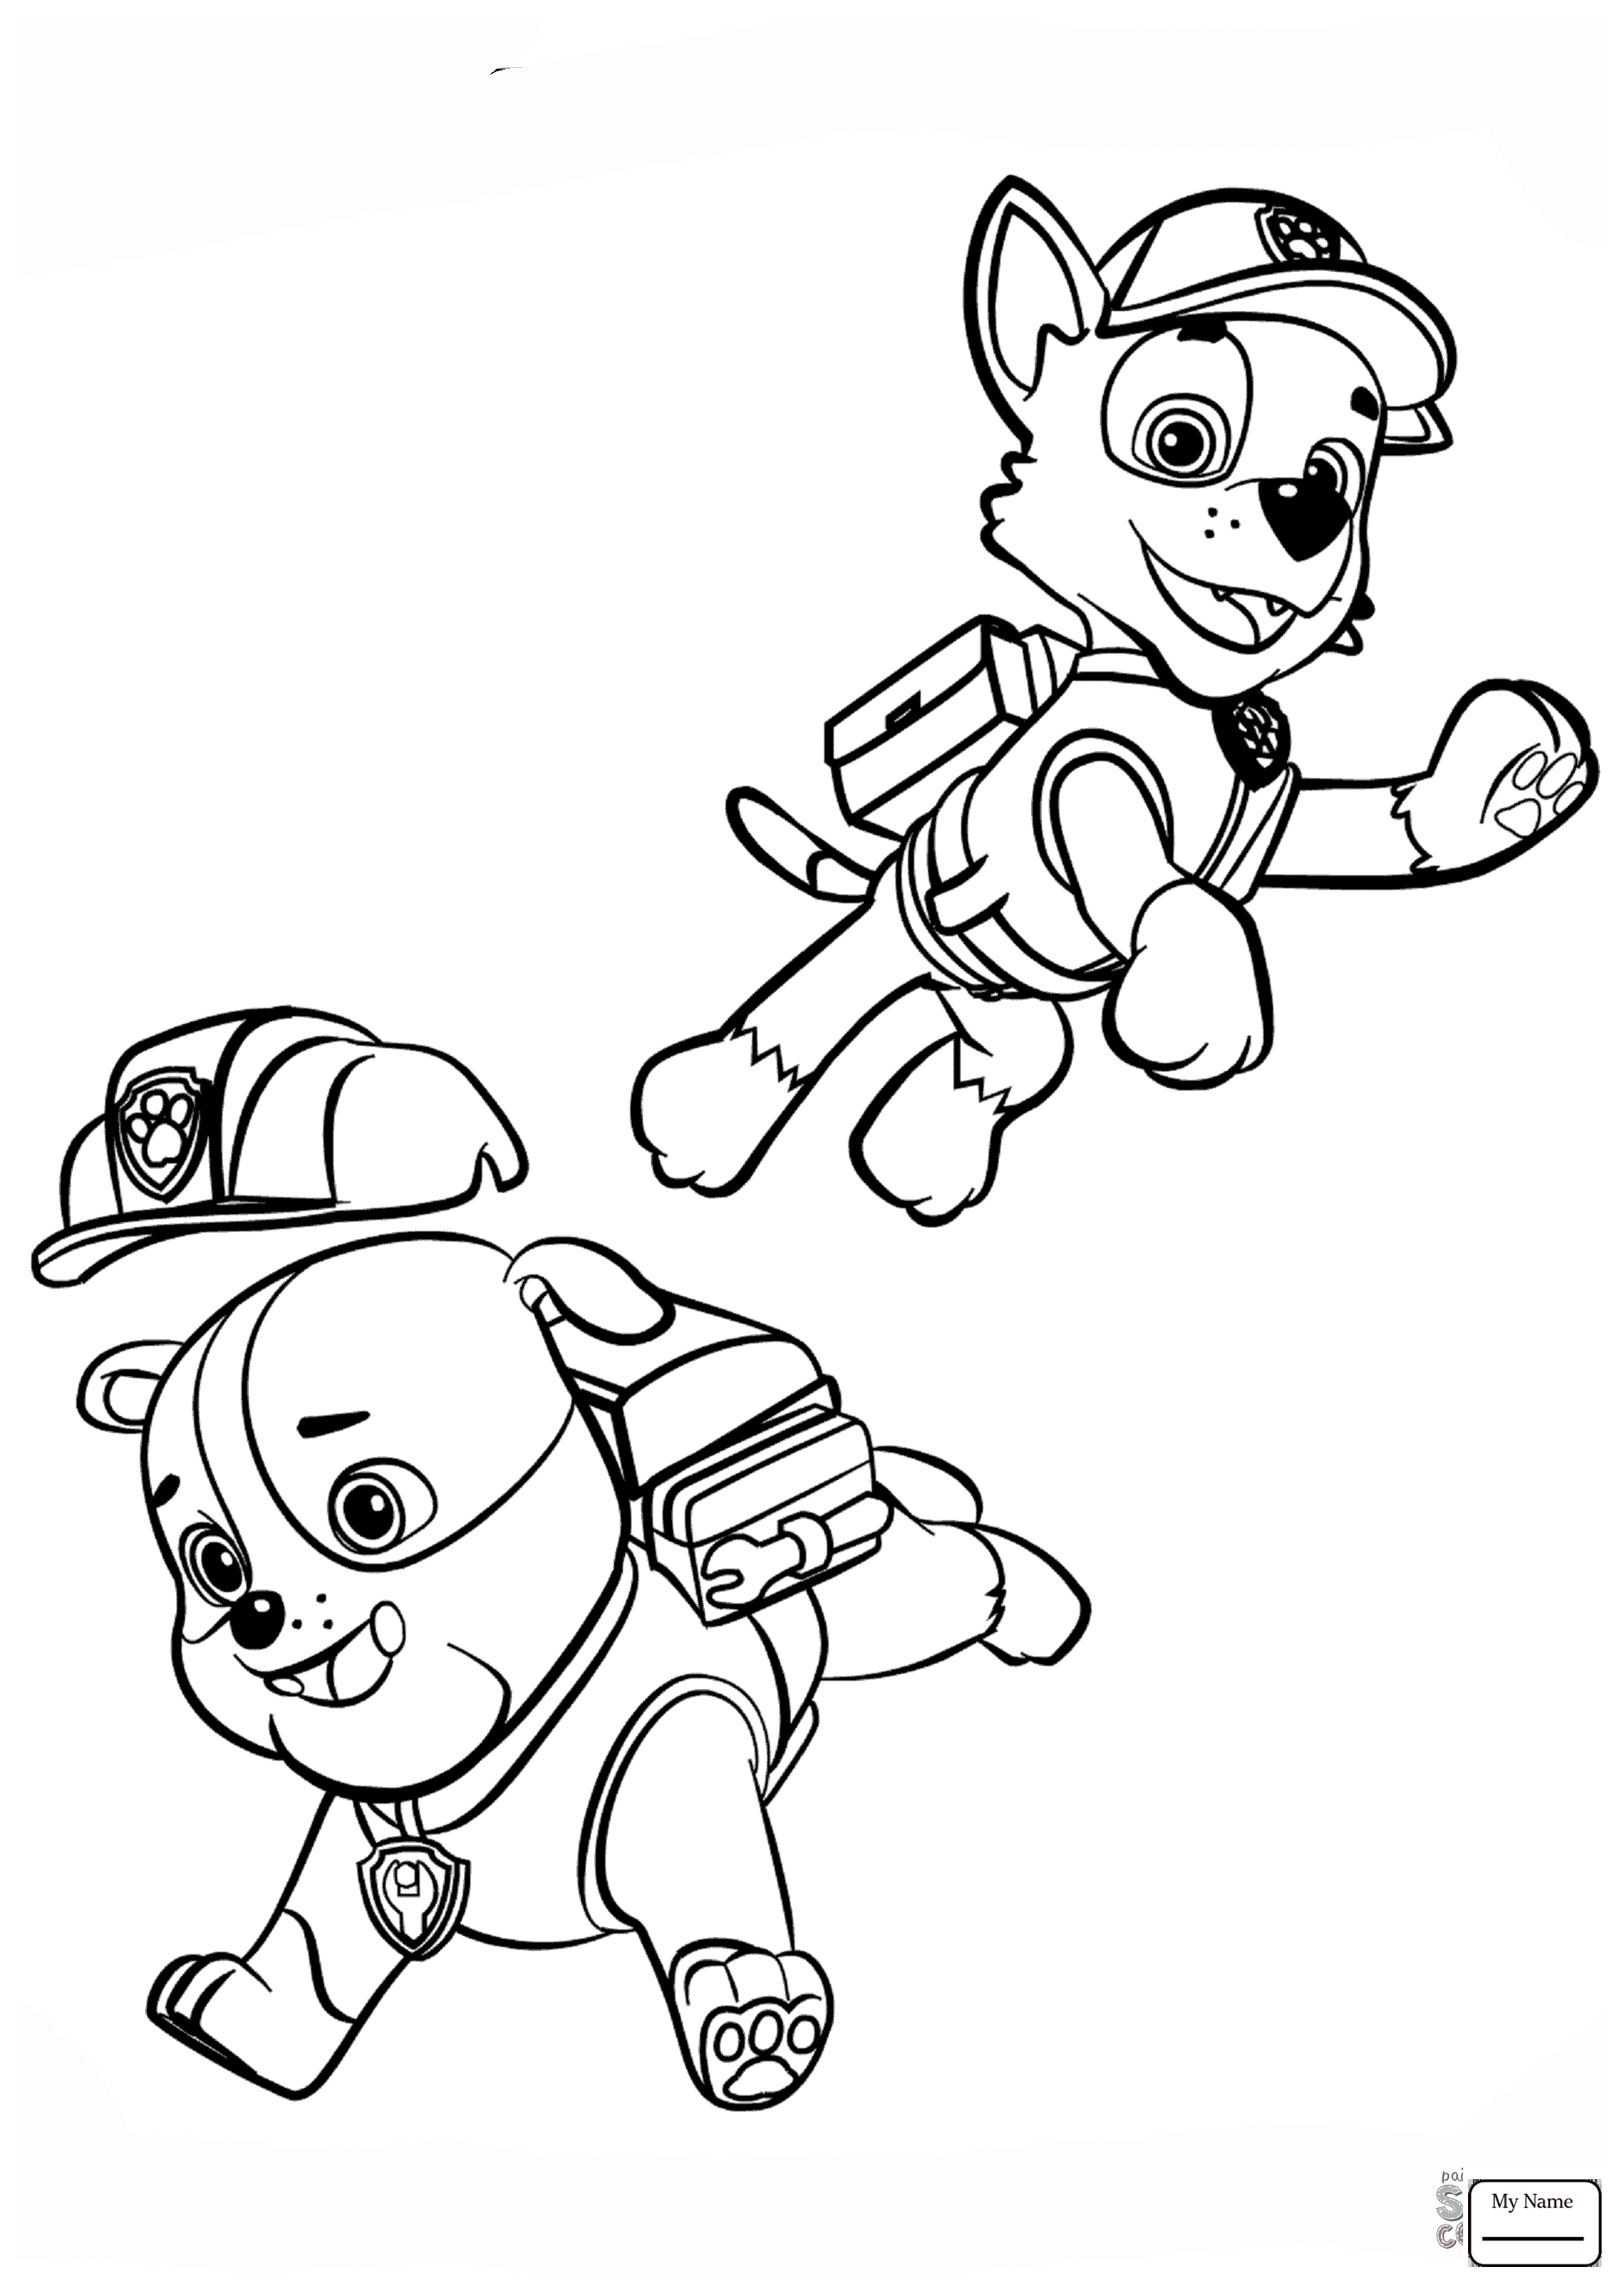 chase paw patrol drawing at getdrawings  free download